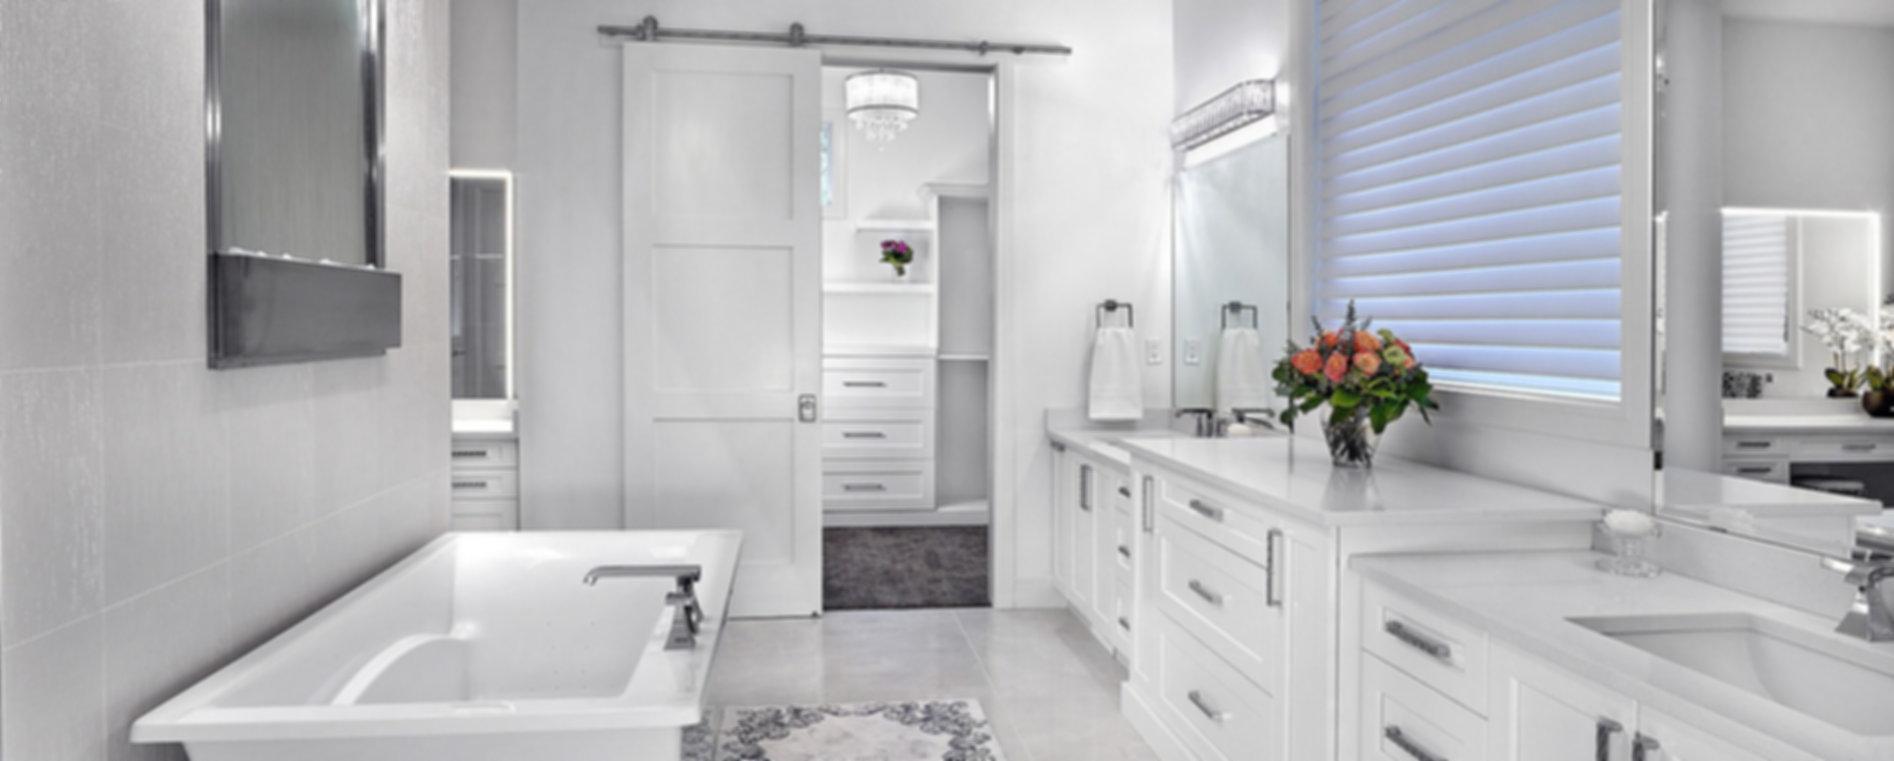 bathroom image 2.jpg